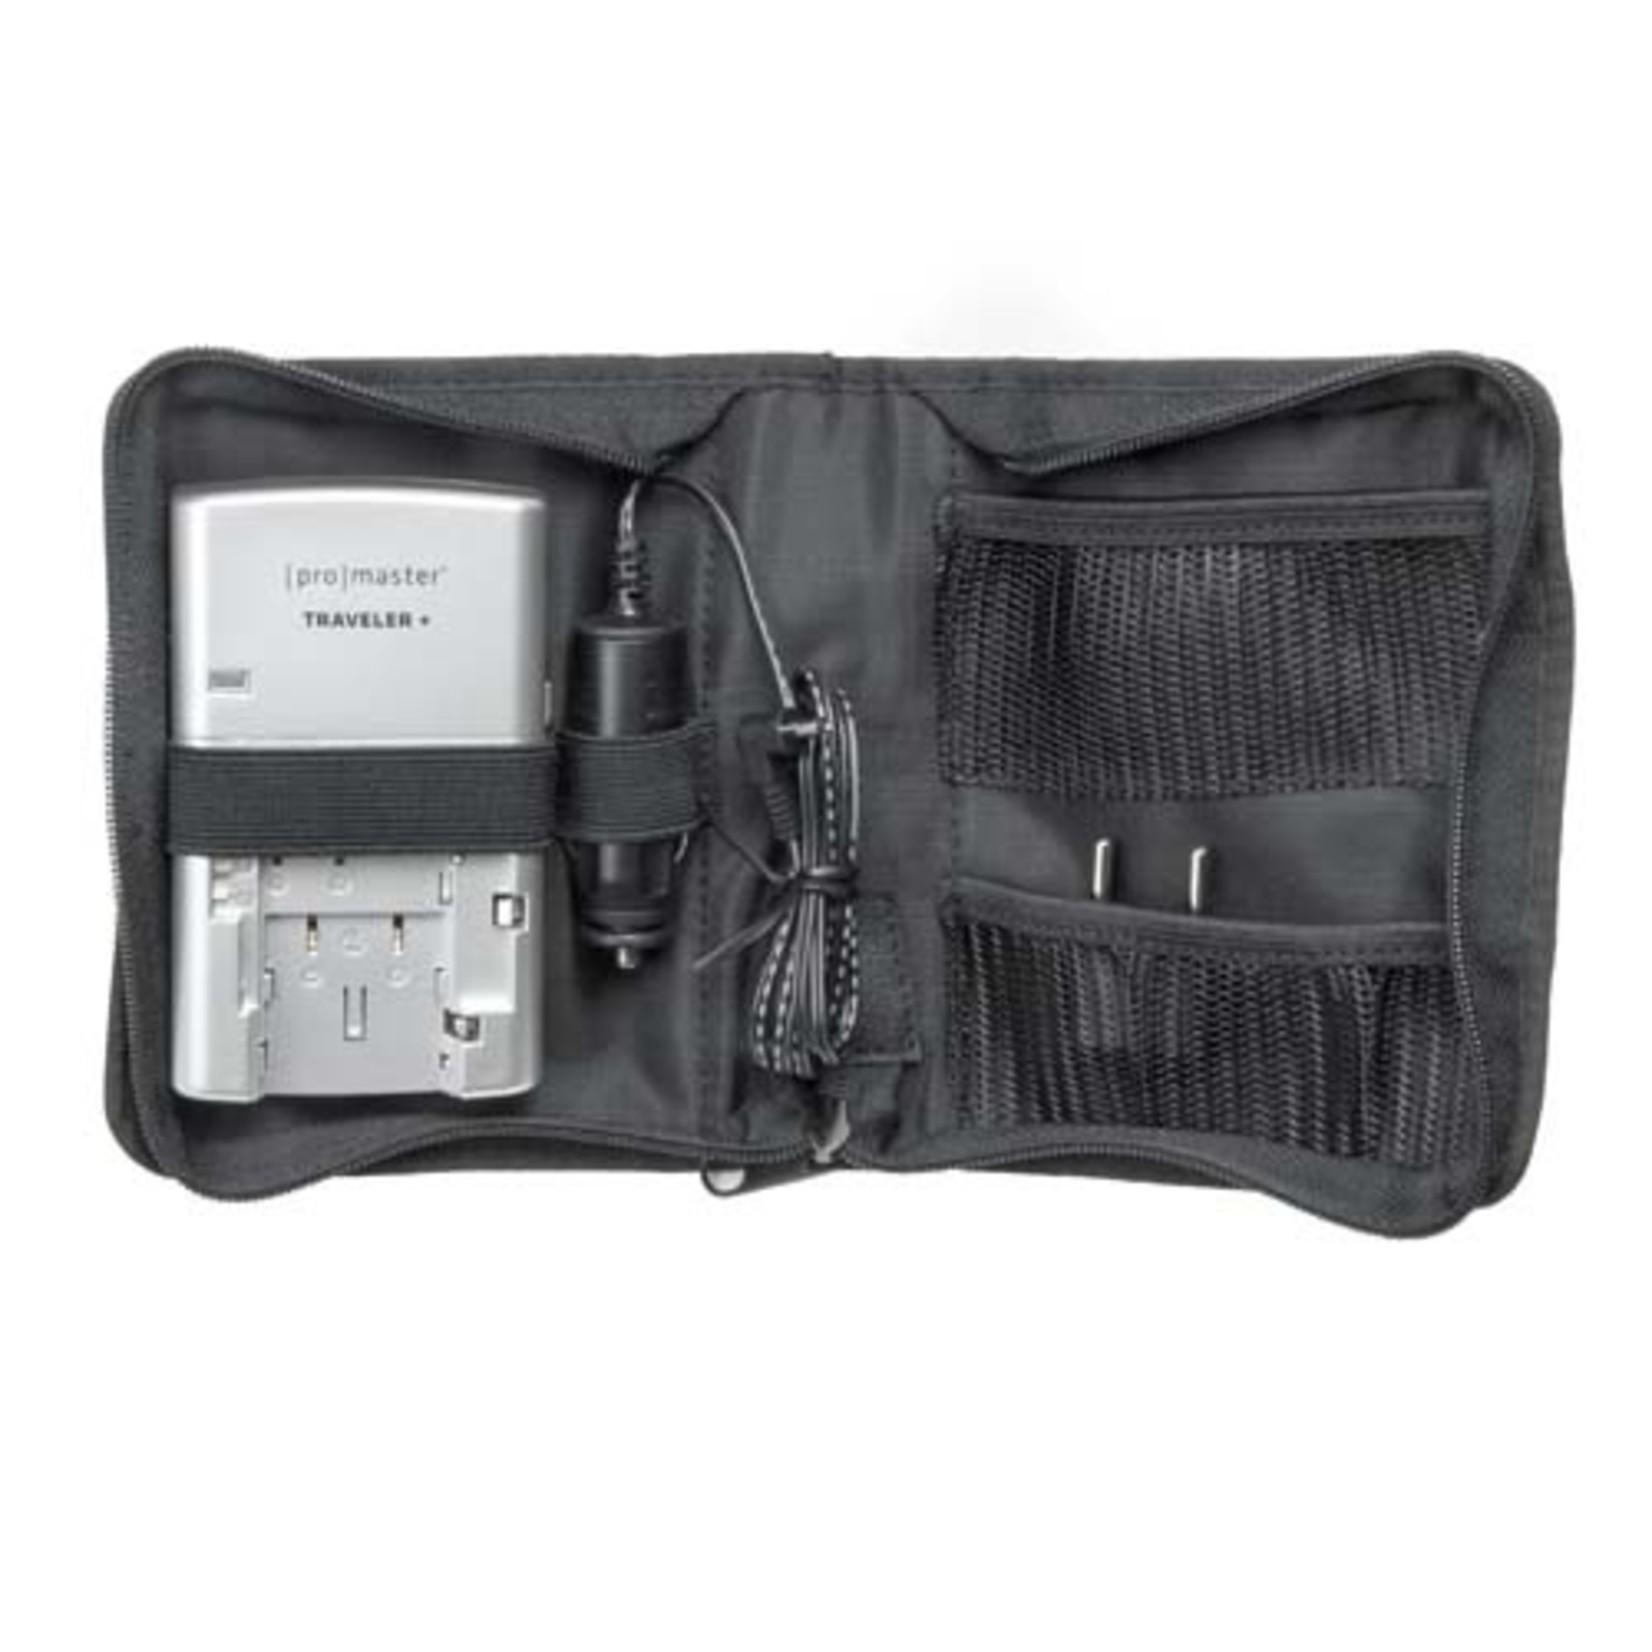 ProMaster Traveler + Travel Kit